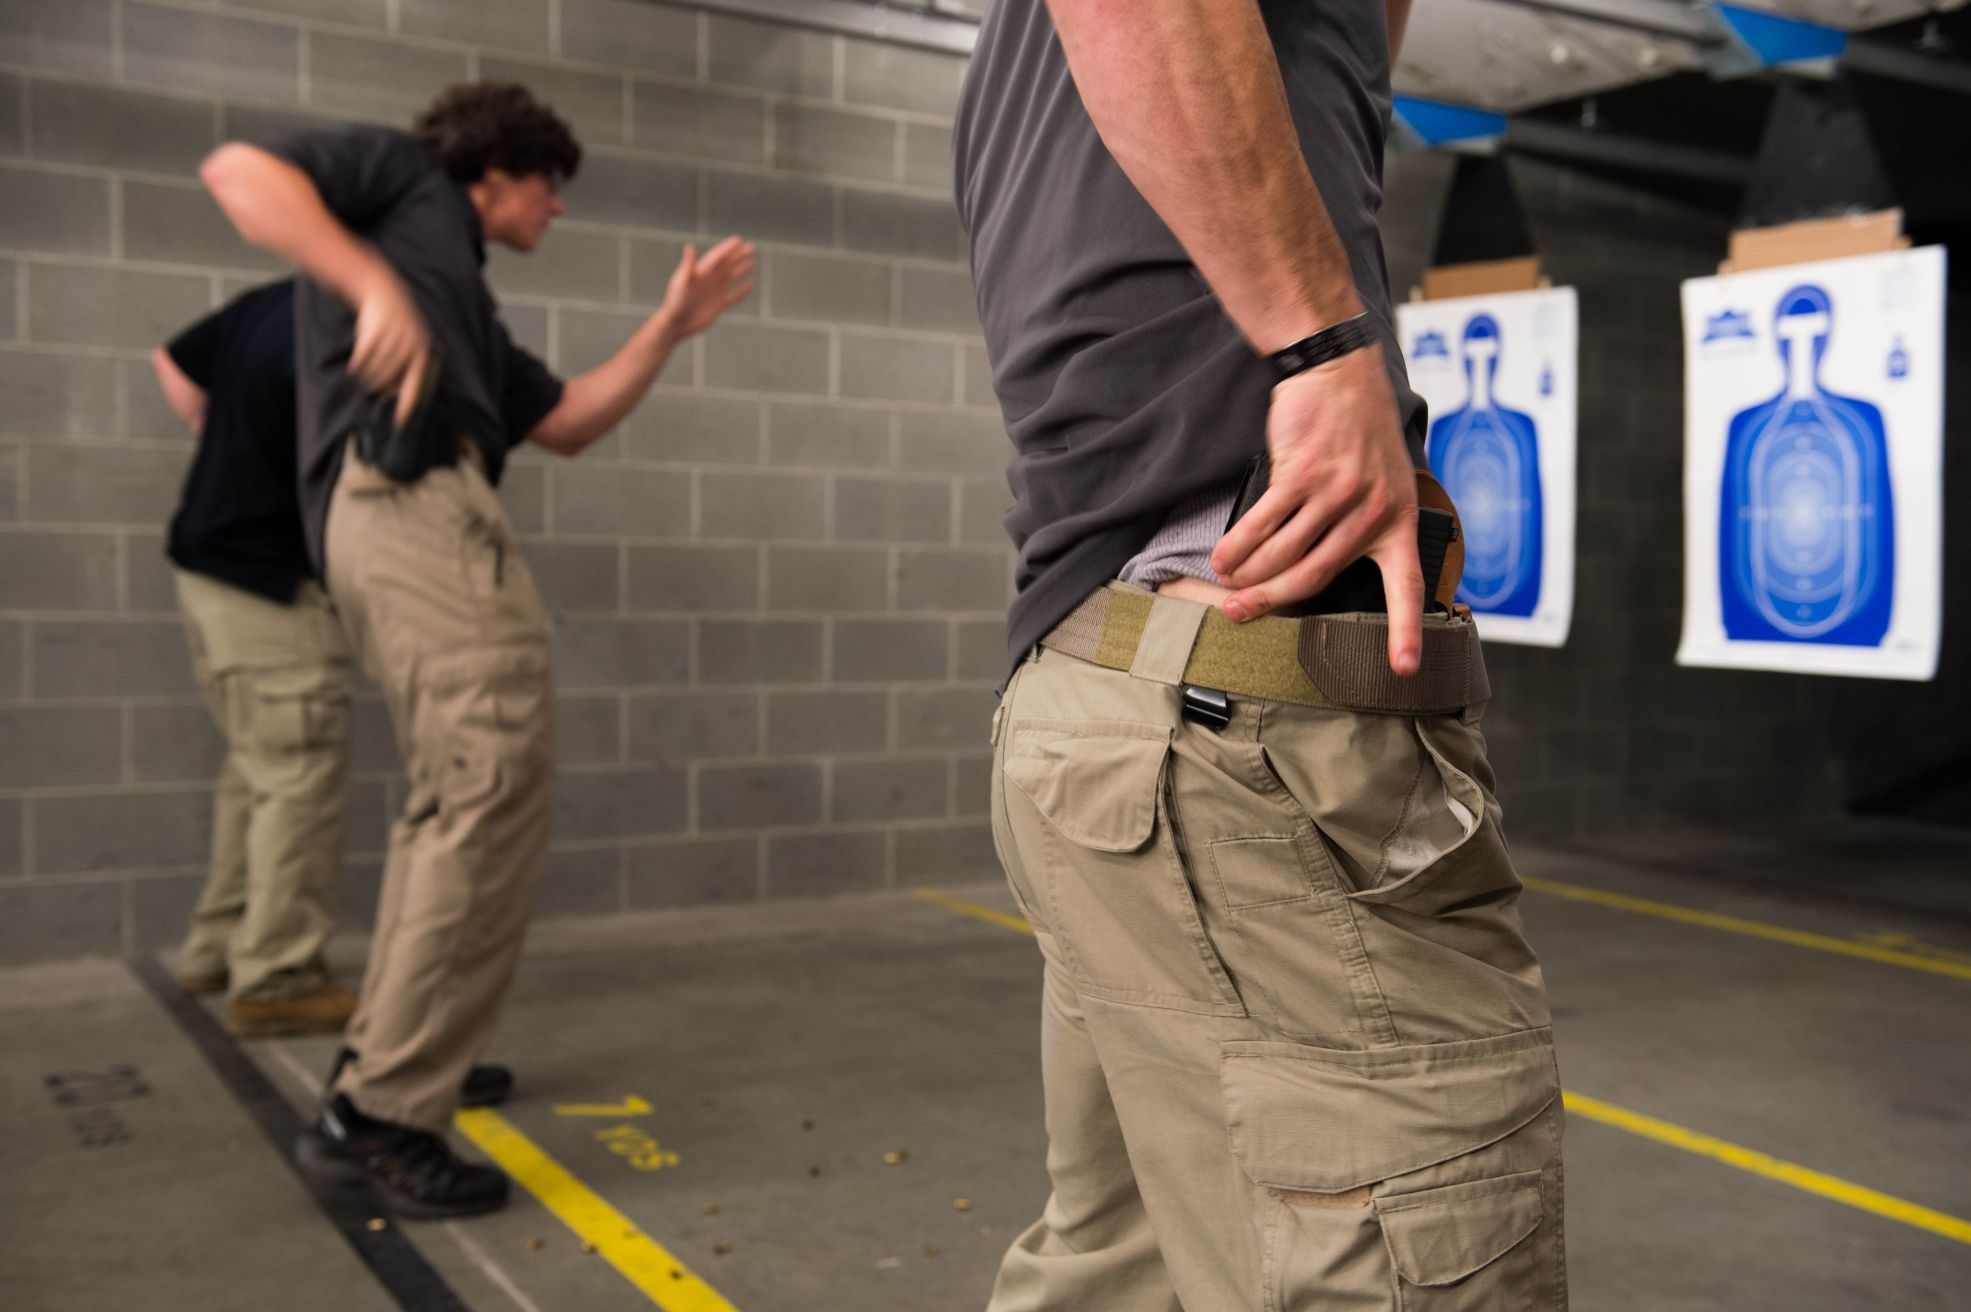 Pin on Self Defense Tips